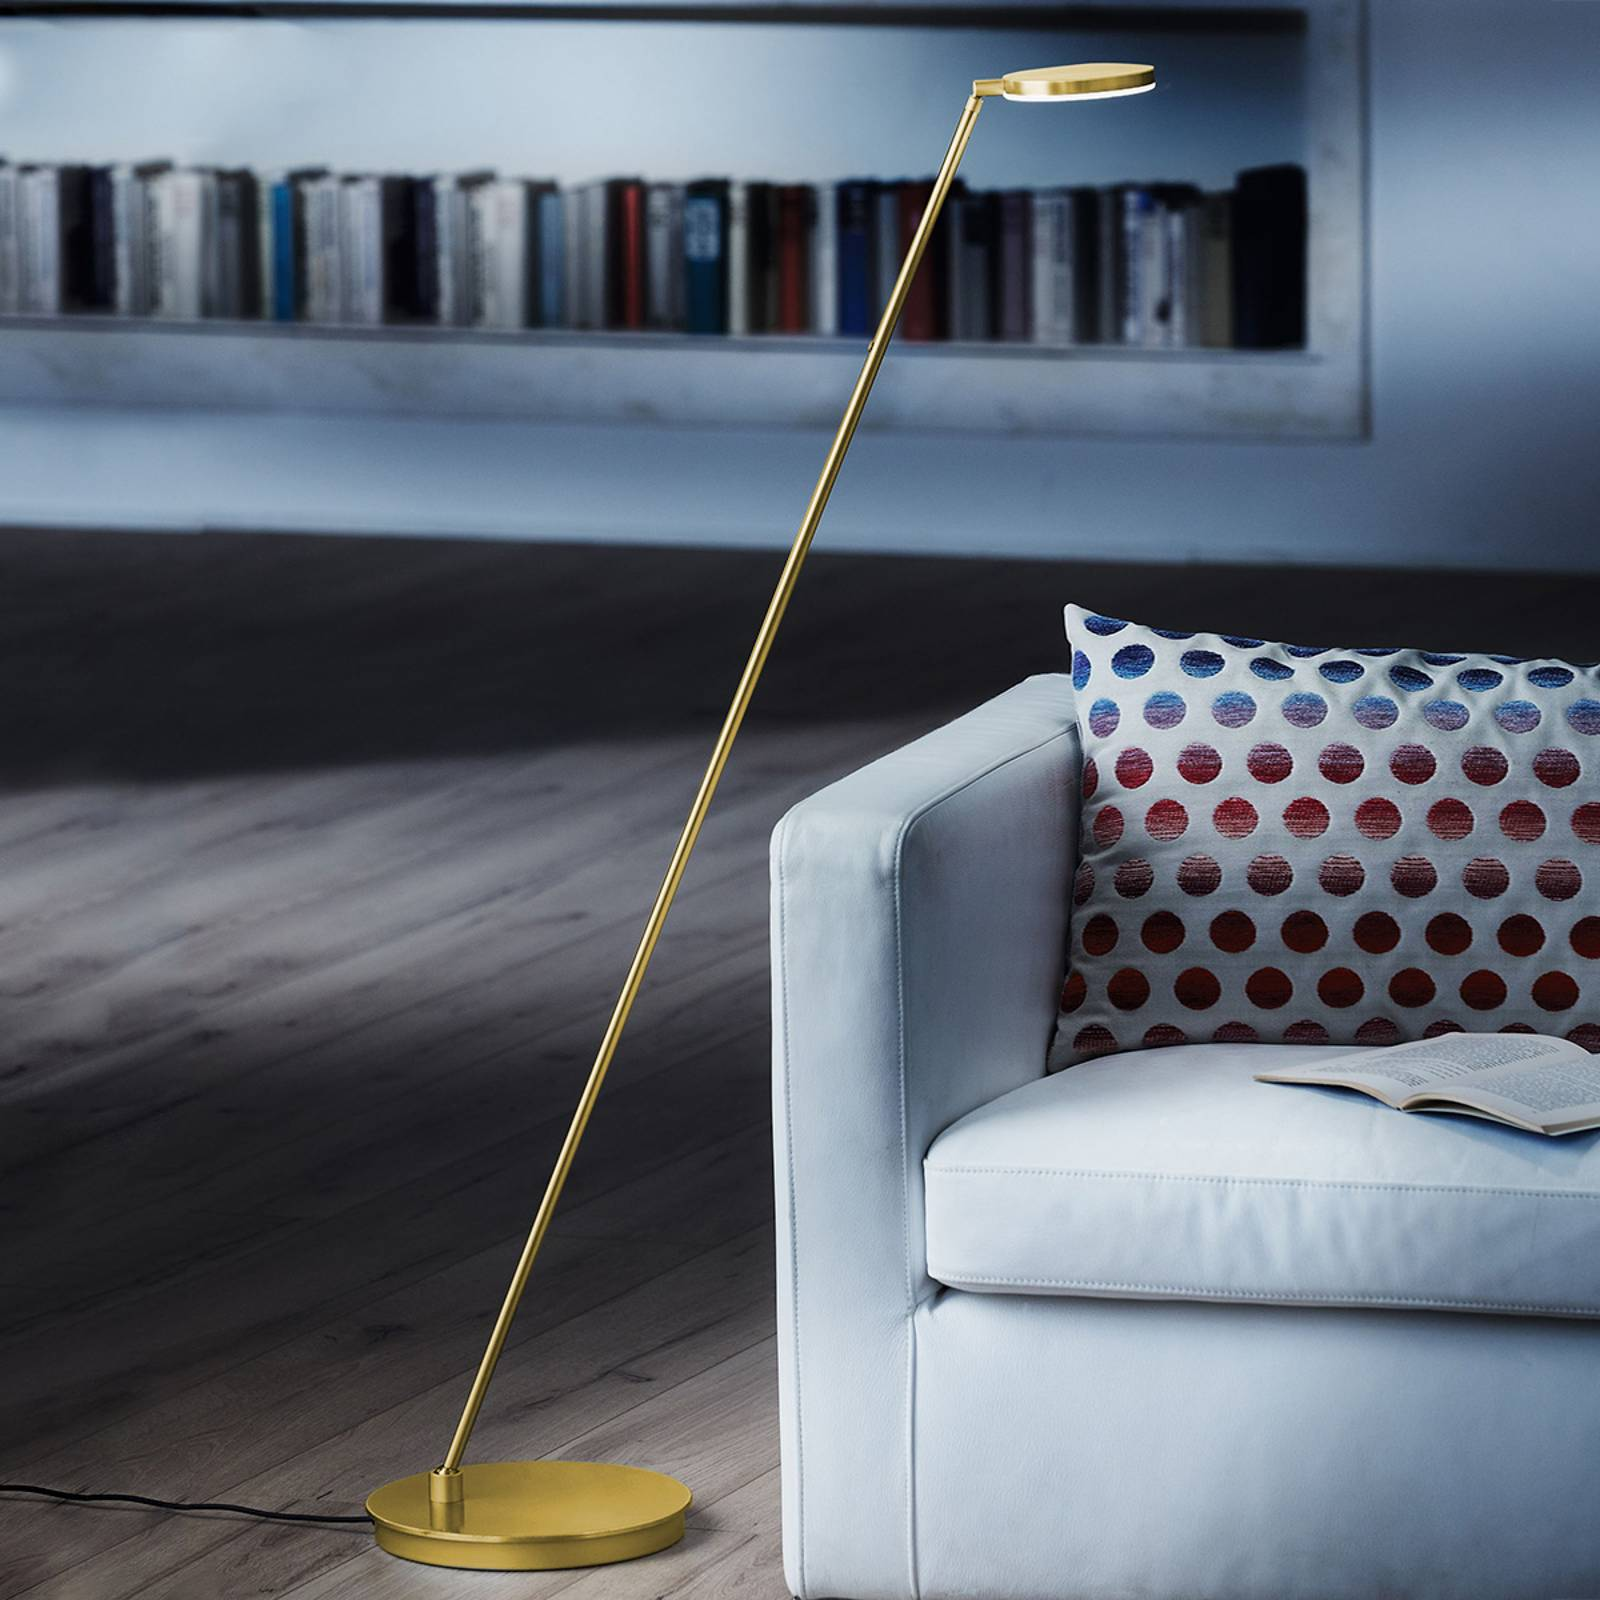 Holtkötter Plano S - LED vloerlamp, messing